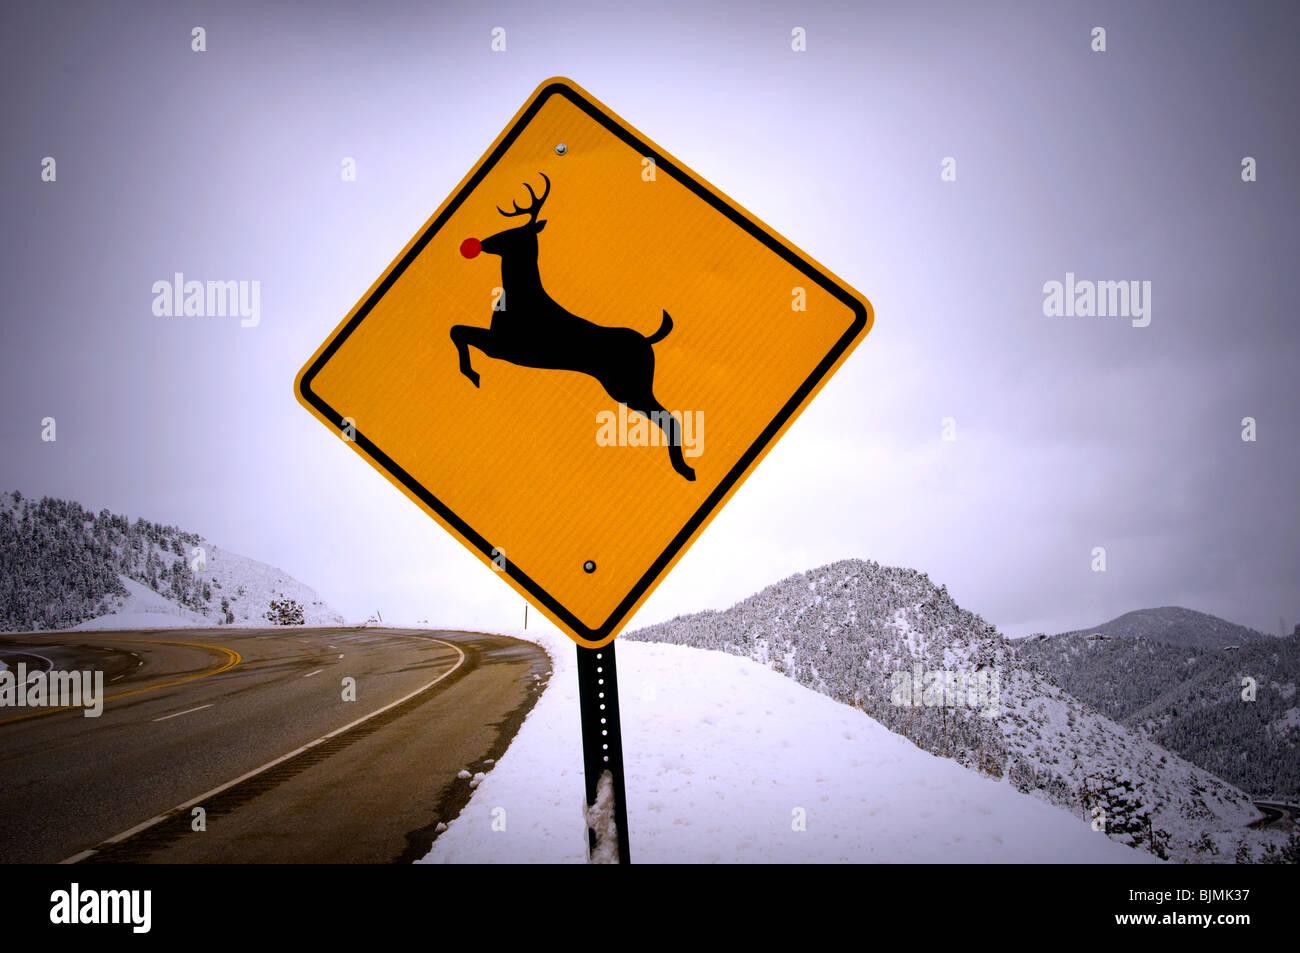 animal crossing sign - Stock Image